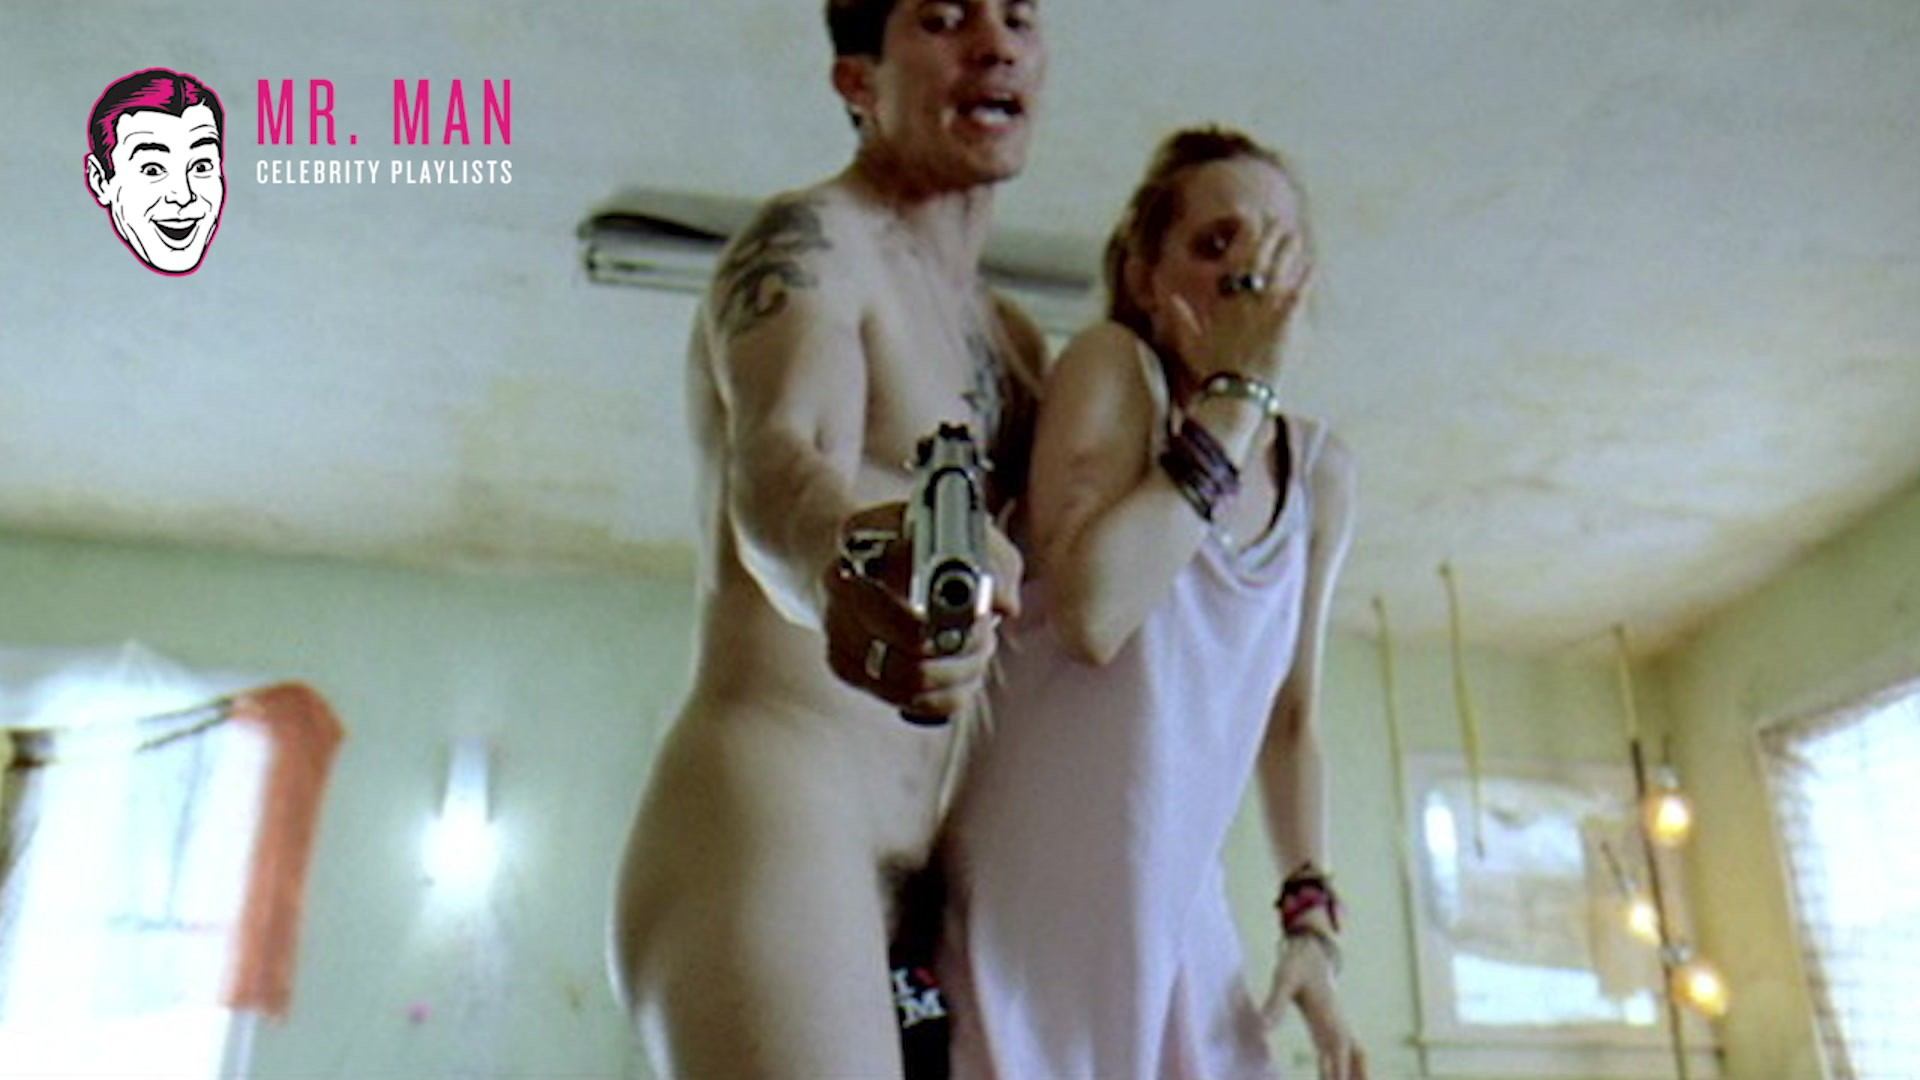 Barek naked m elyas Netflixable? German